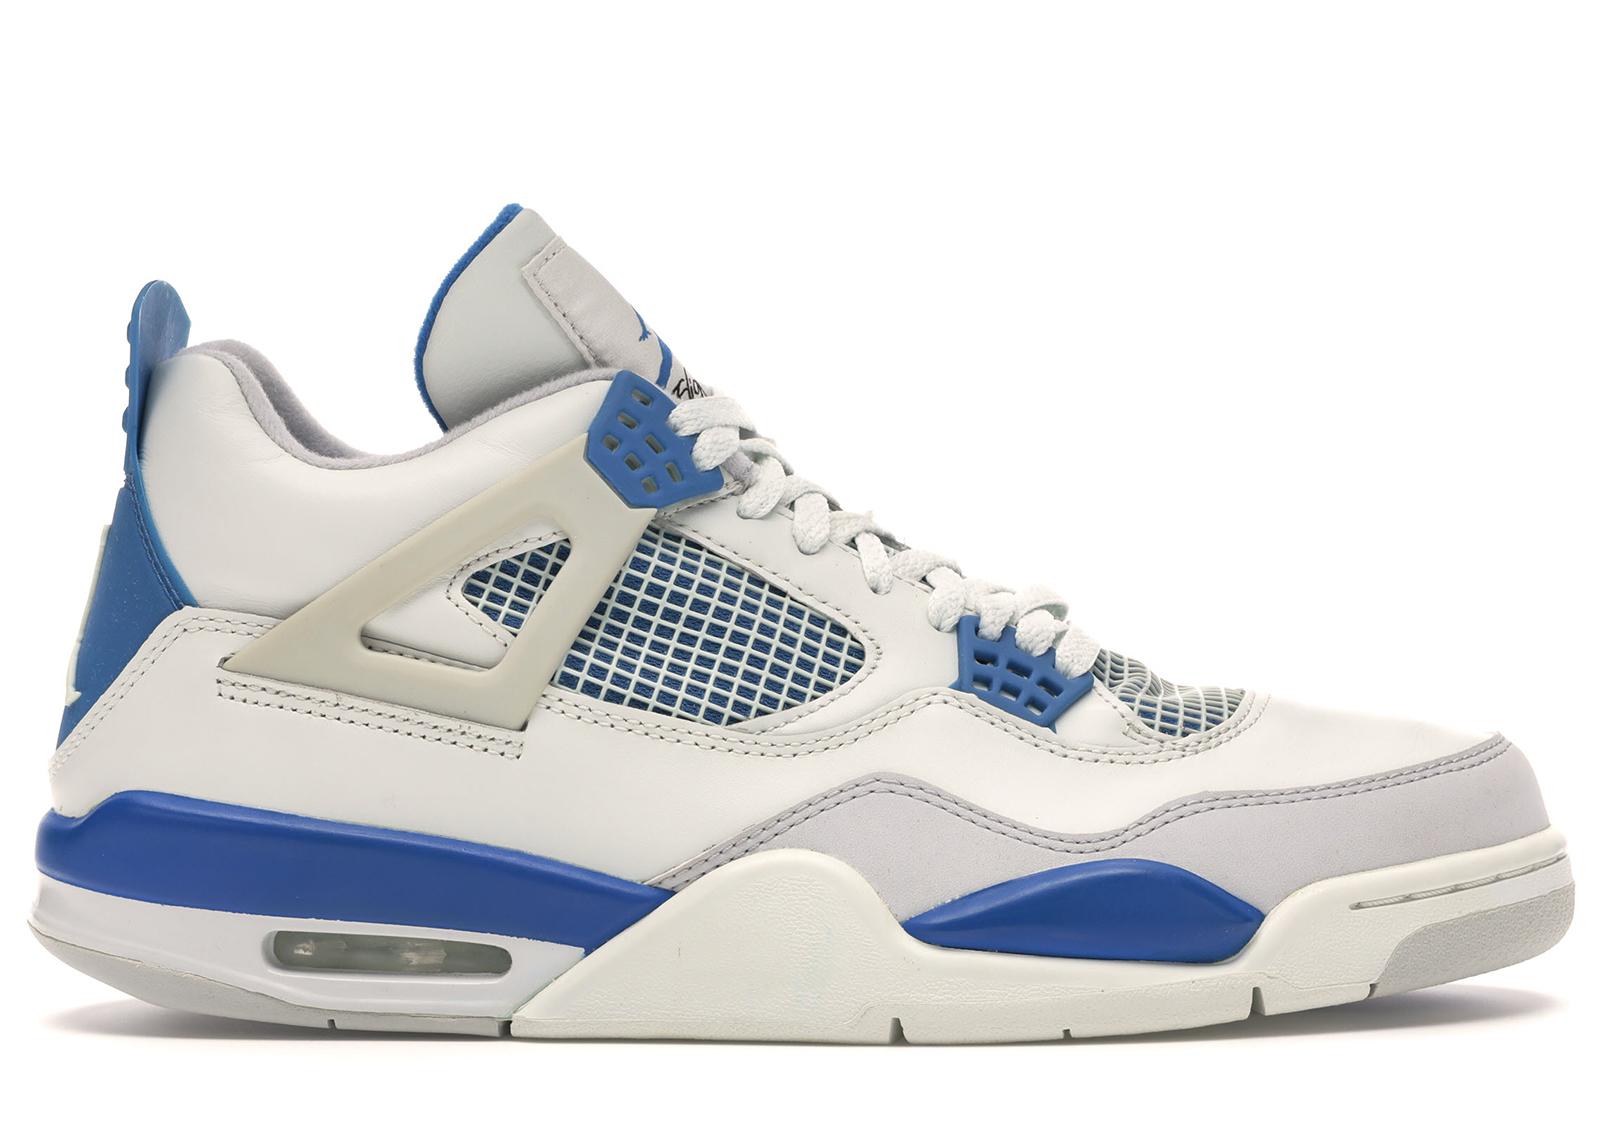 Jordan 4 Retro Military Blue (2006